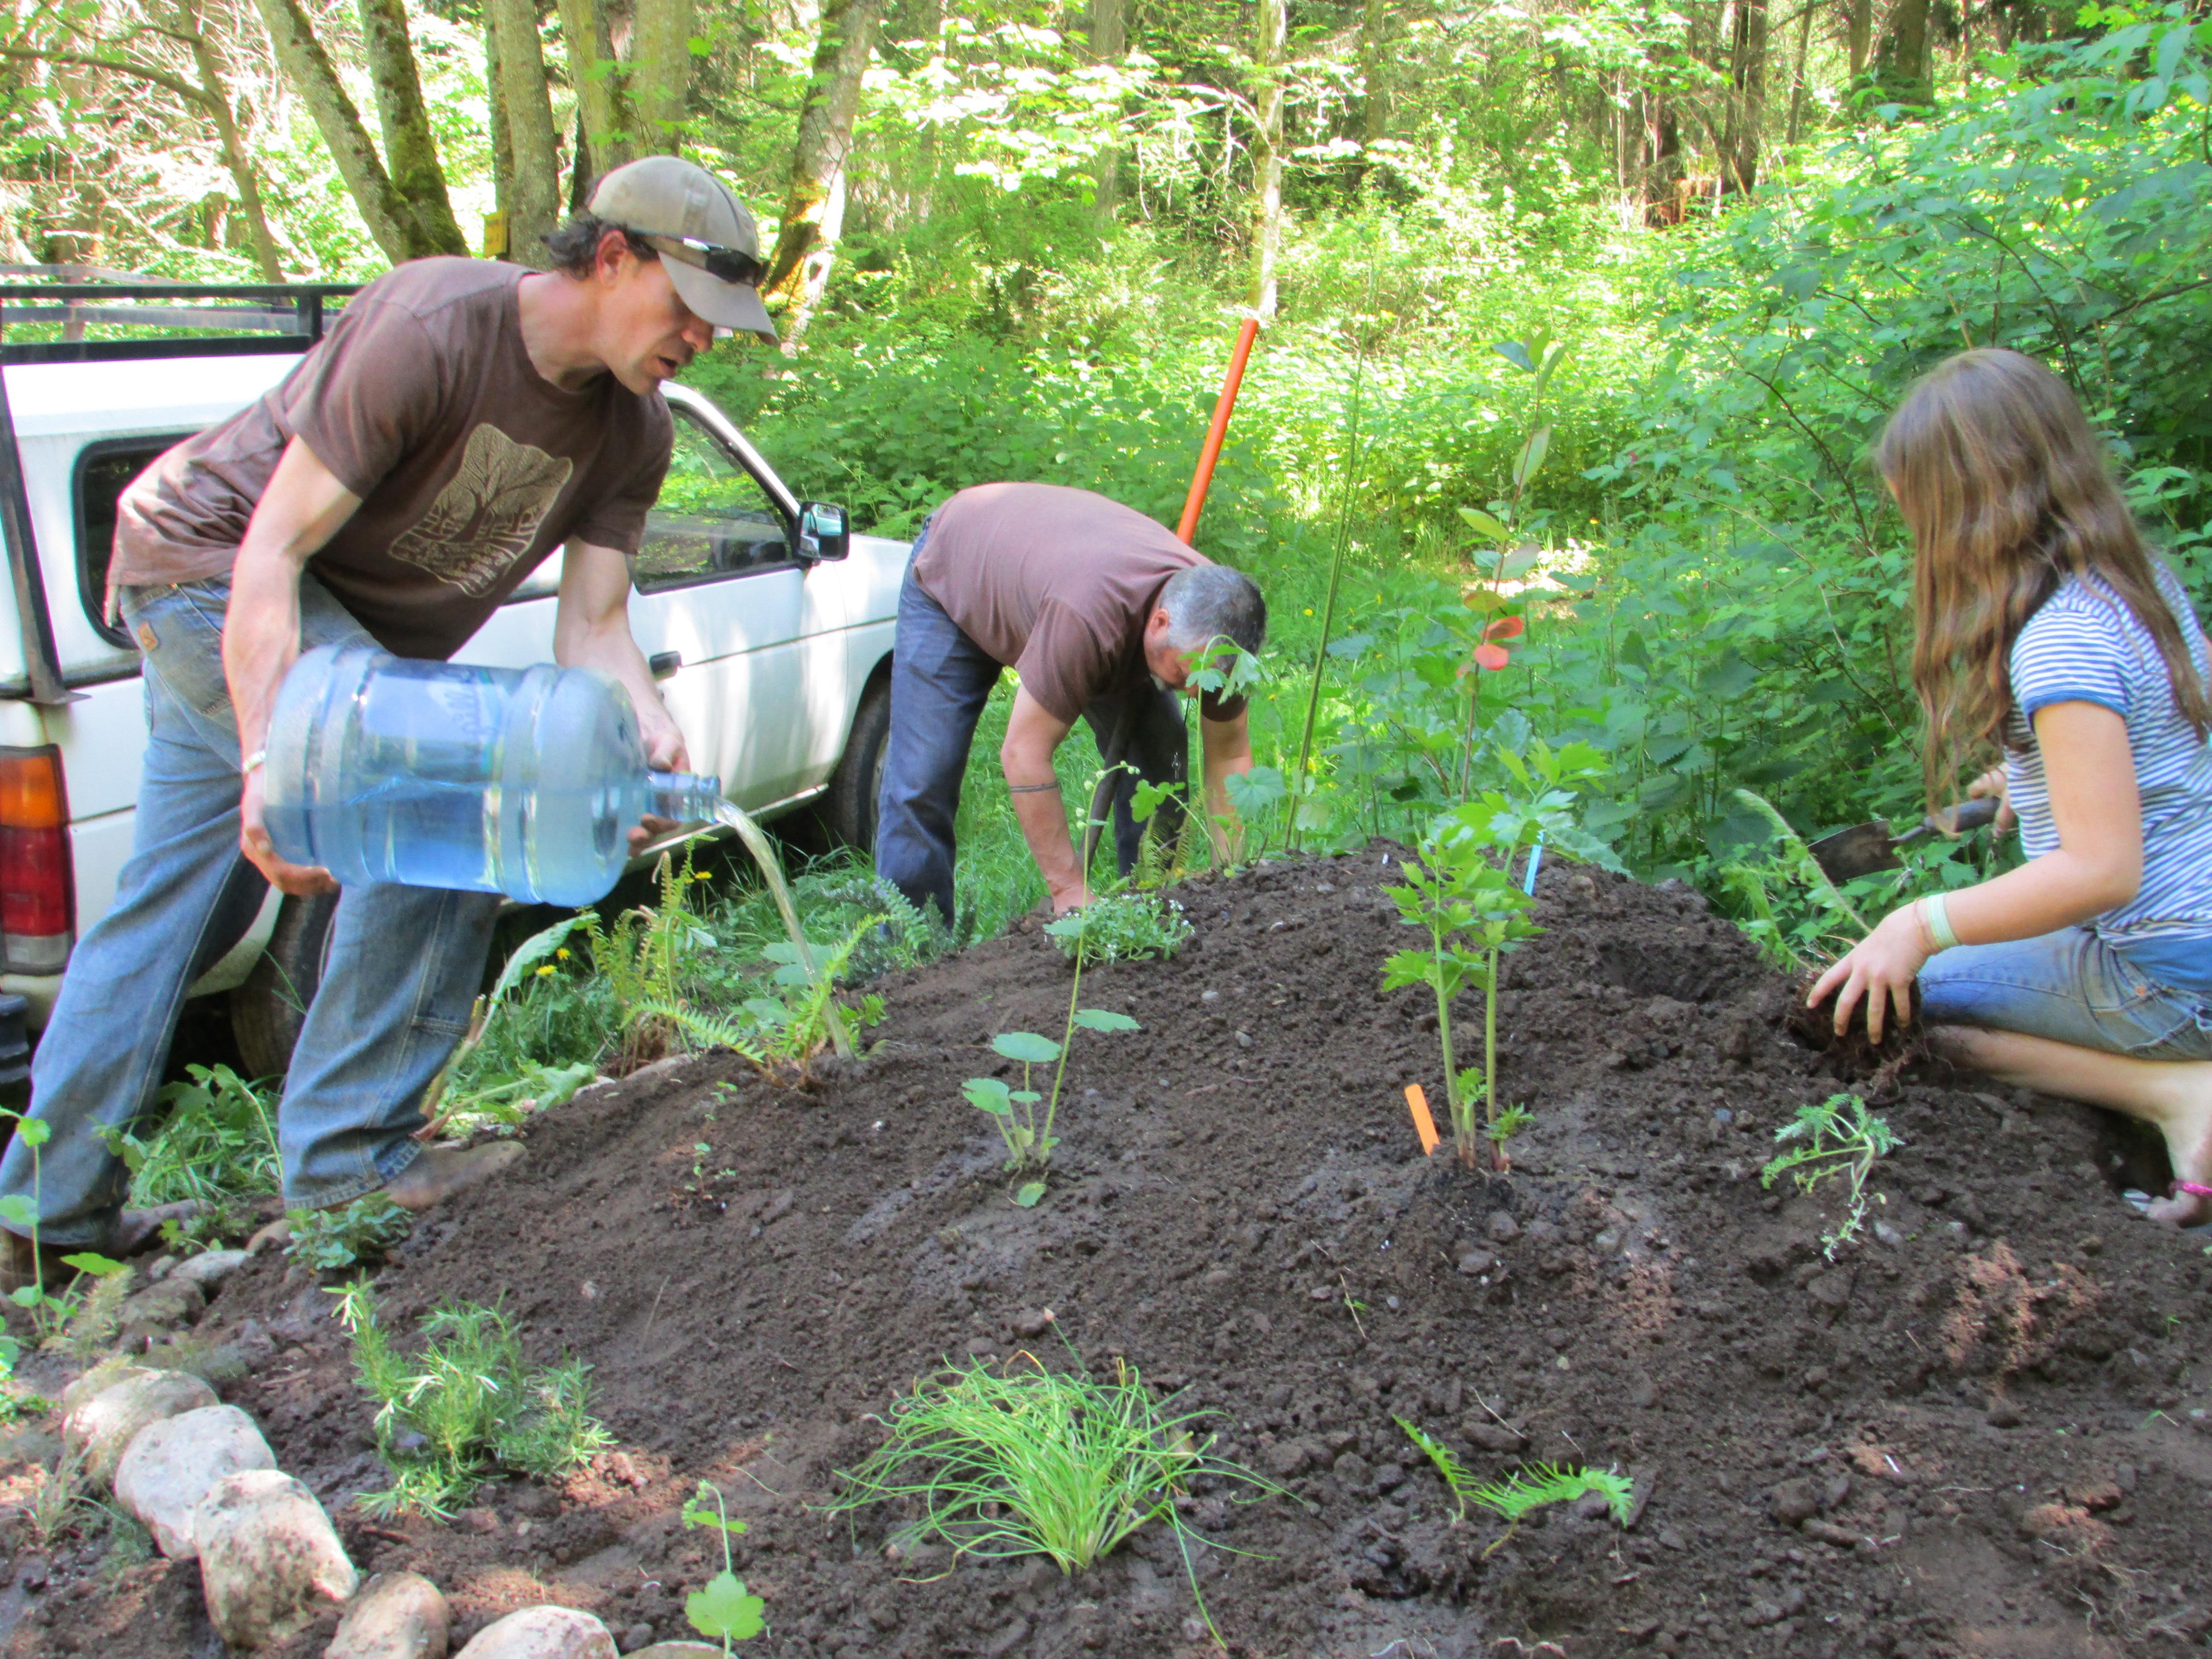 Small beginnings - a kitchen garden mound at the Mustard Seed Village